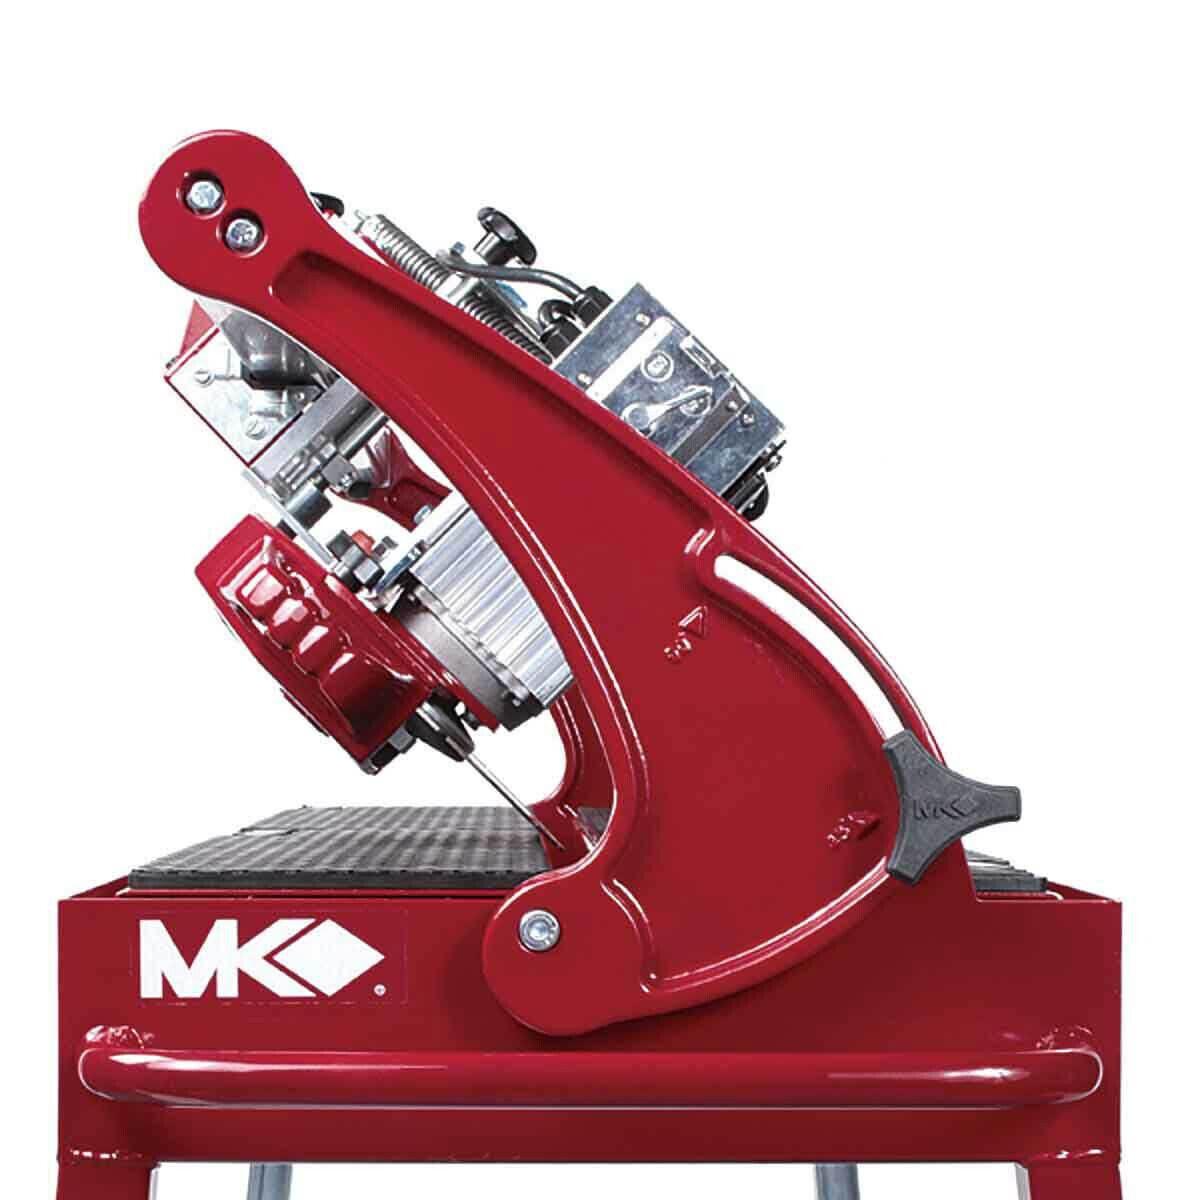 mk 212 tile saw miter cut